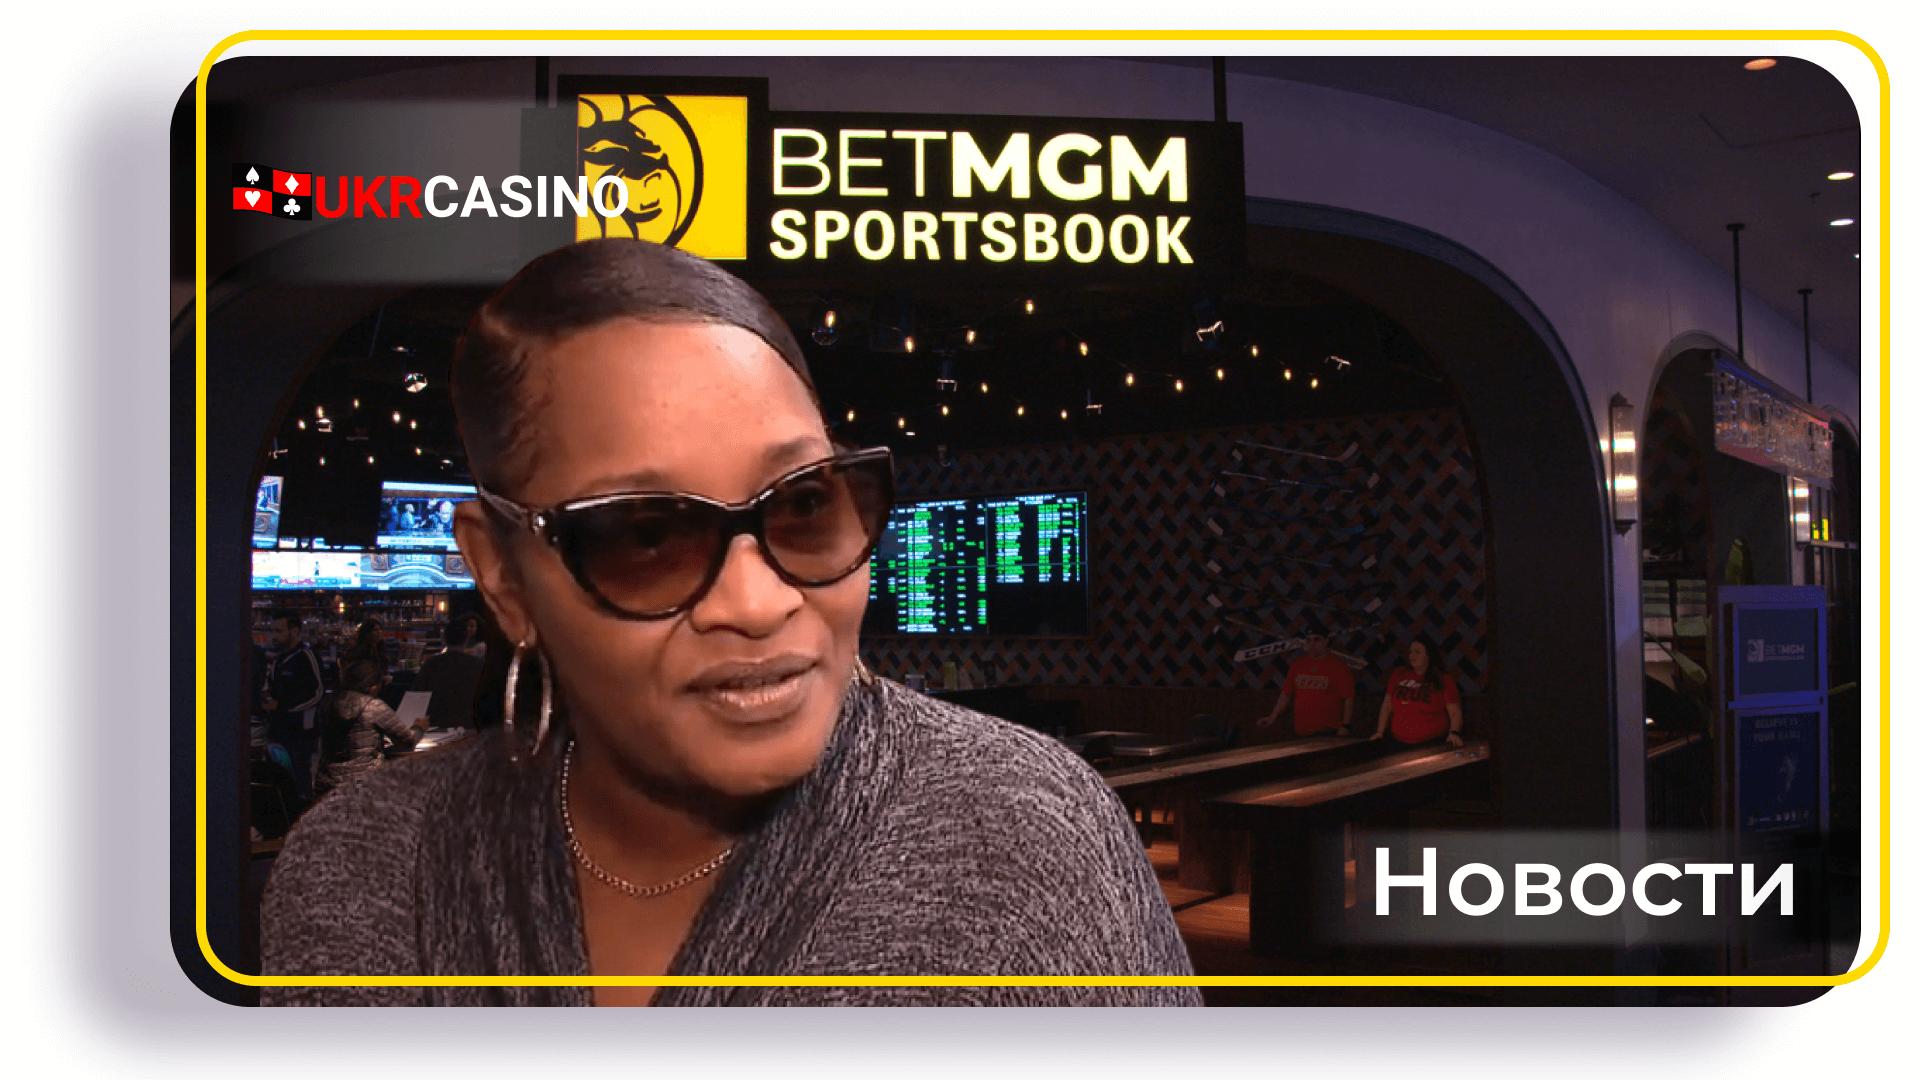 Жительница Америки подала в суд на онлайн-казино